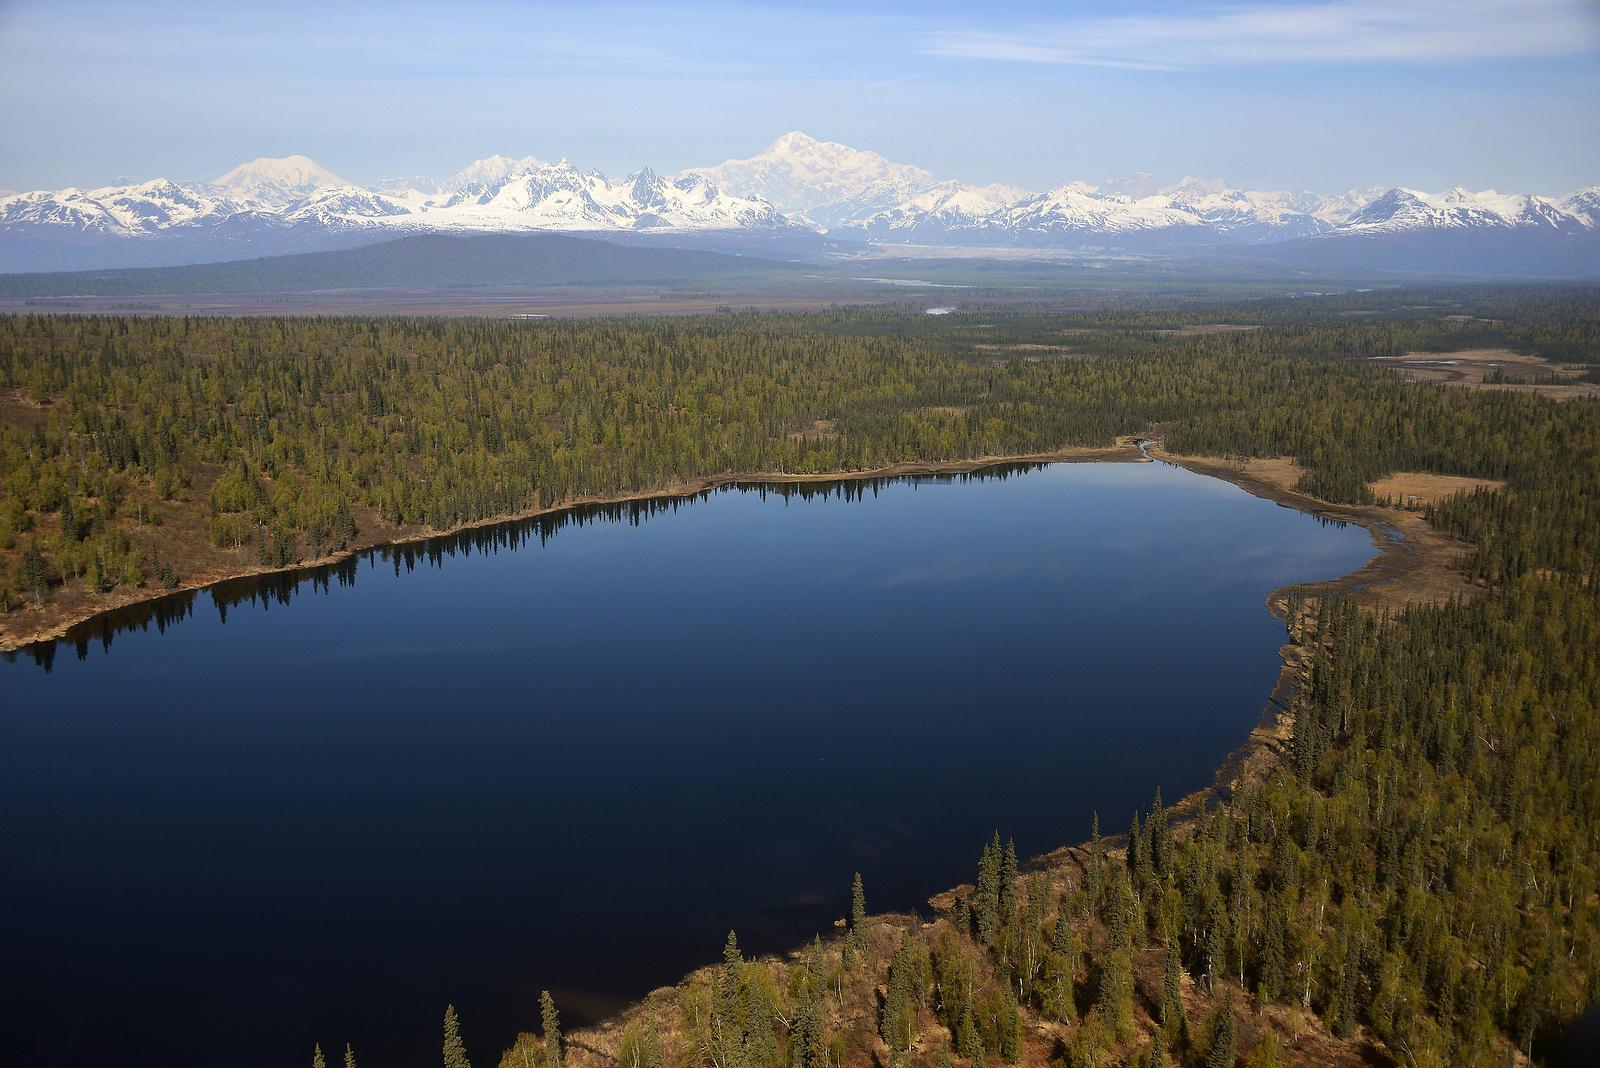 North America's Highest Peak Mt. McKinley, Denali National Park